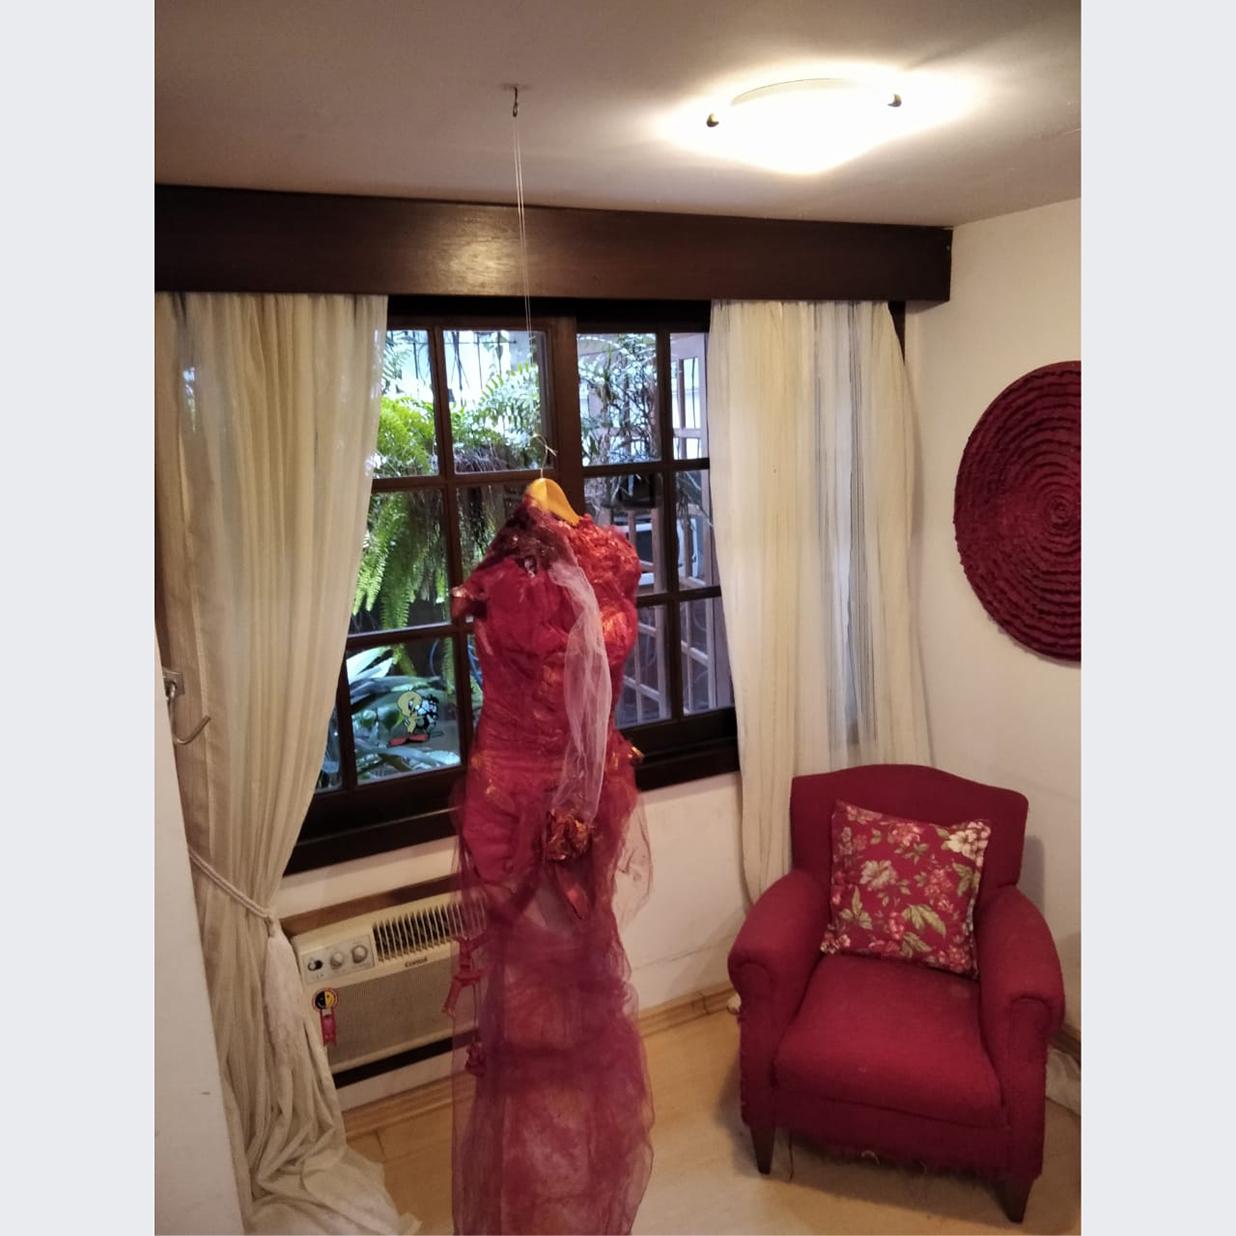 Daisy Viola - Título: vestido mulhercasca na janela